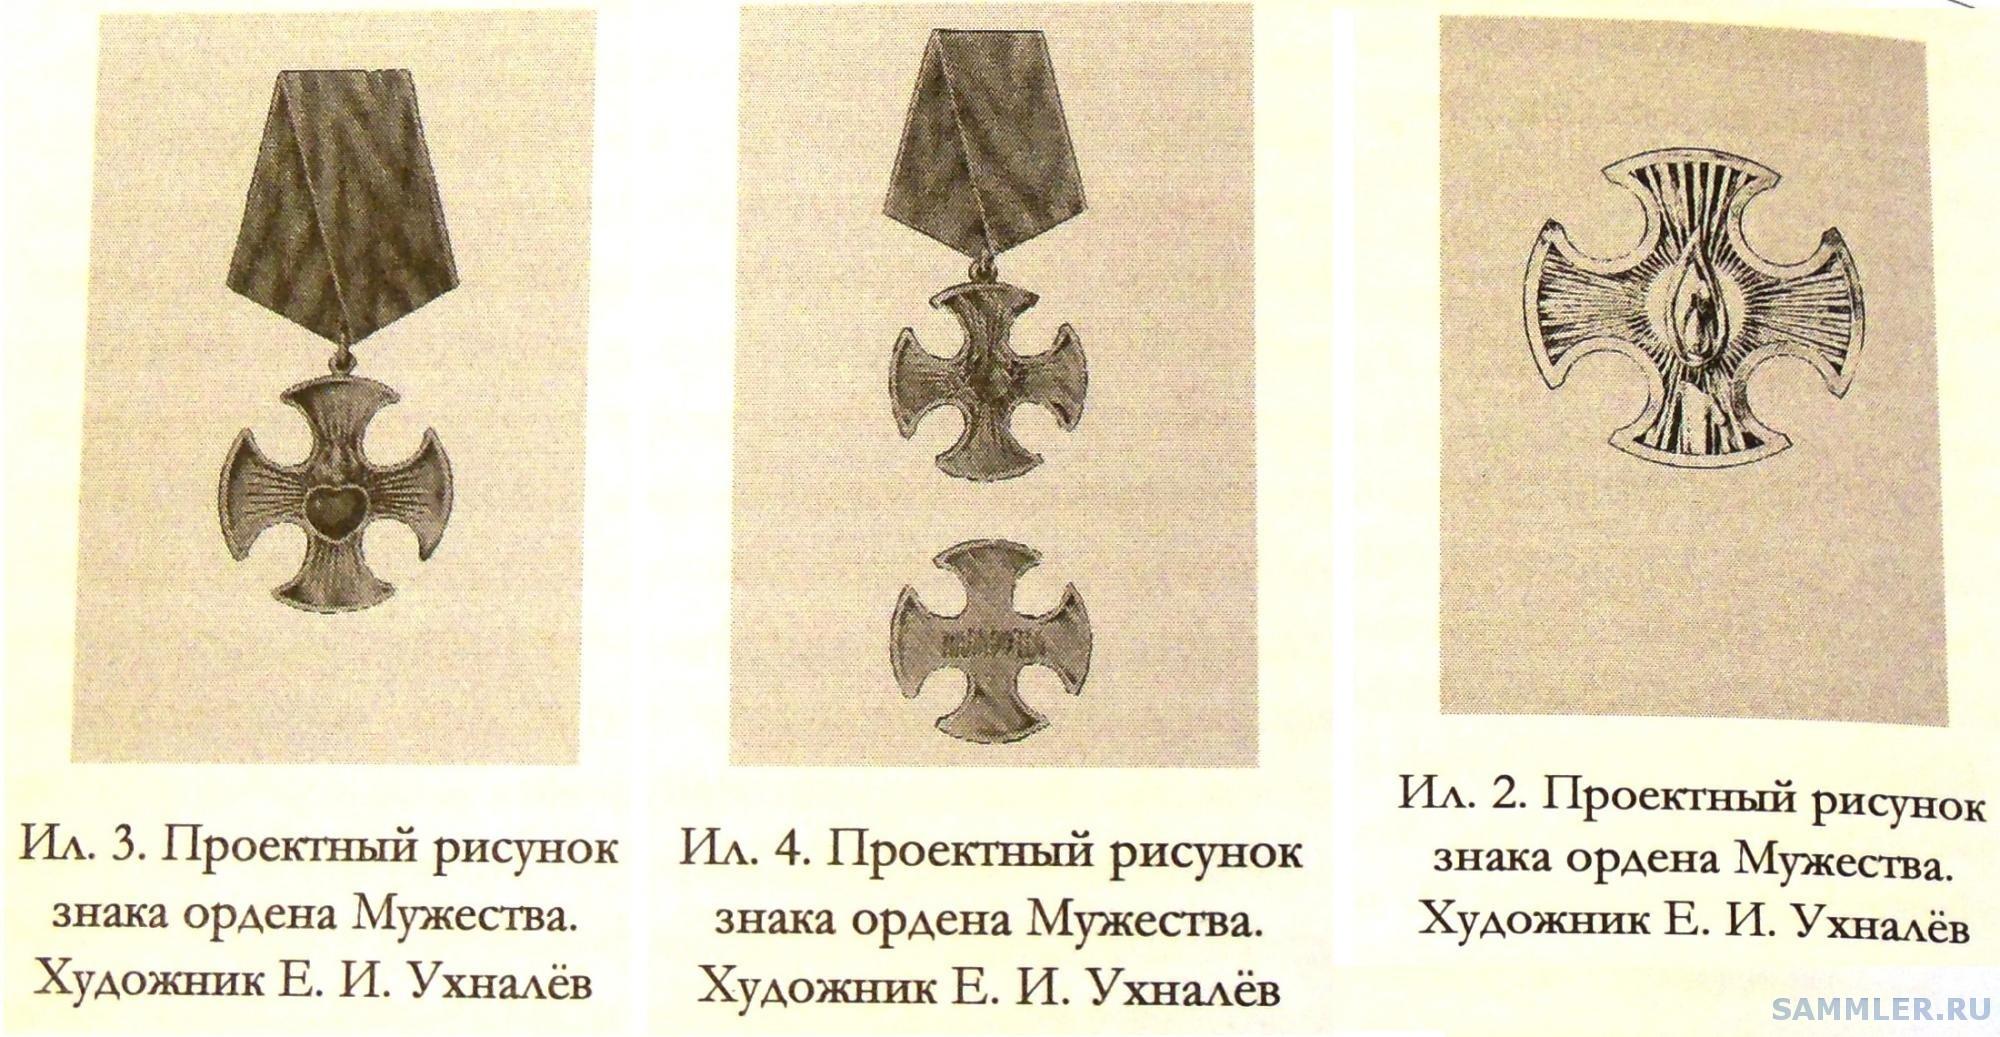 Проекты ордена Мужества - Ухналёв.JPG